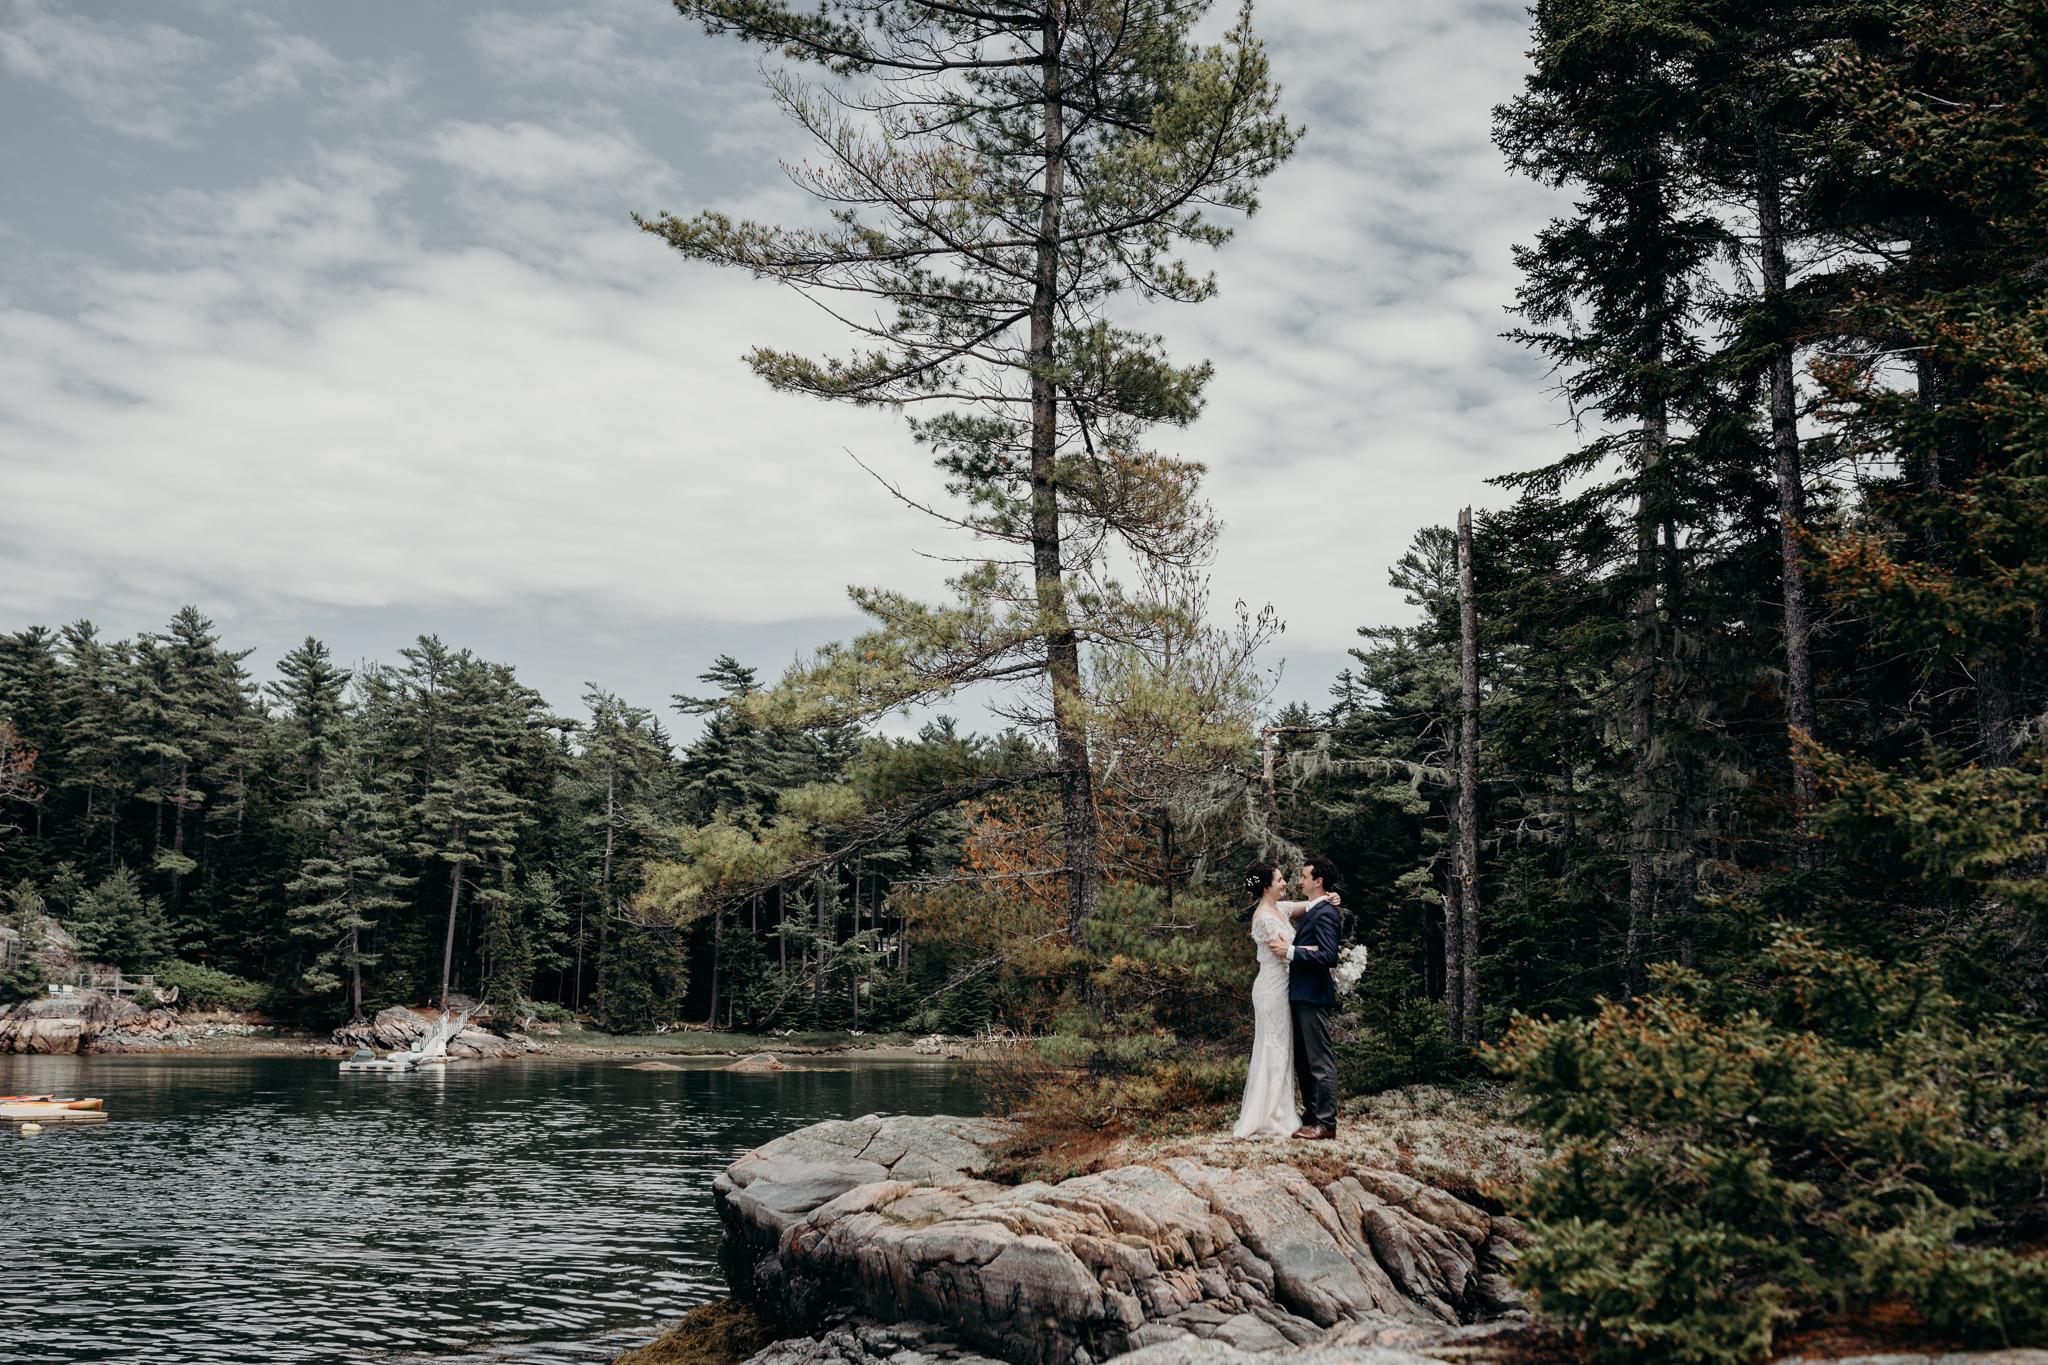 erinwheatco-9187 Maine Wedding by the Sea | Ruth & Ryan